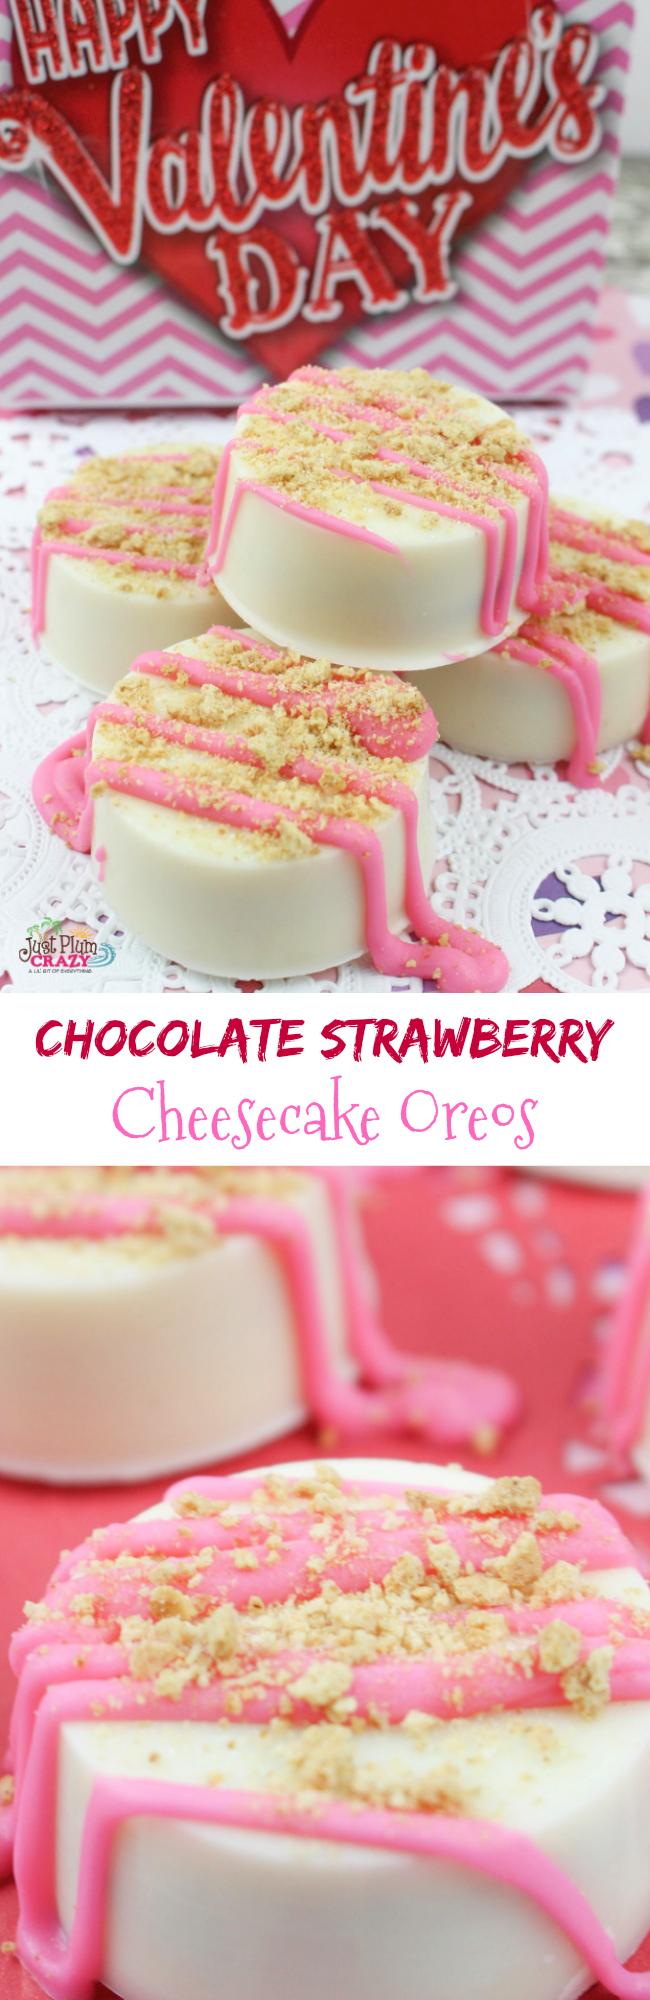 chocolate strawberry cheesecake Oreos